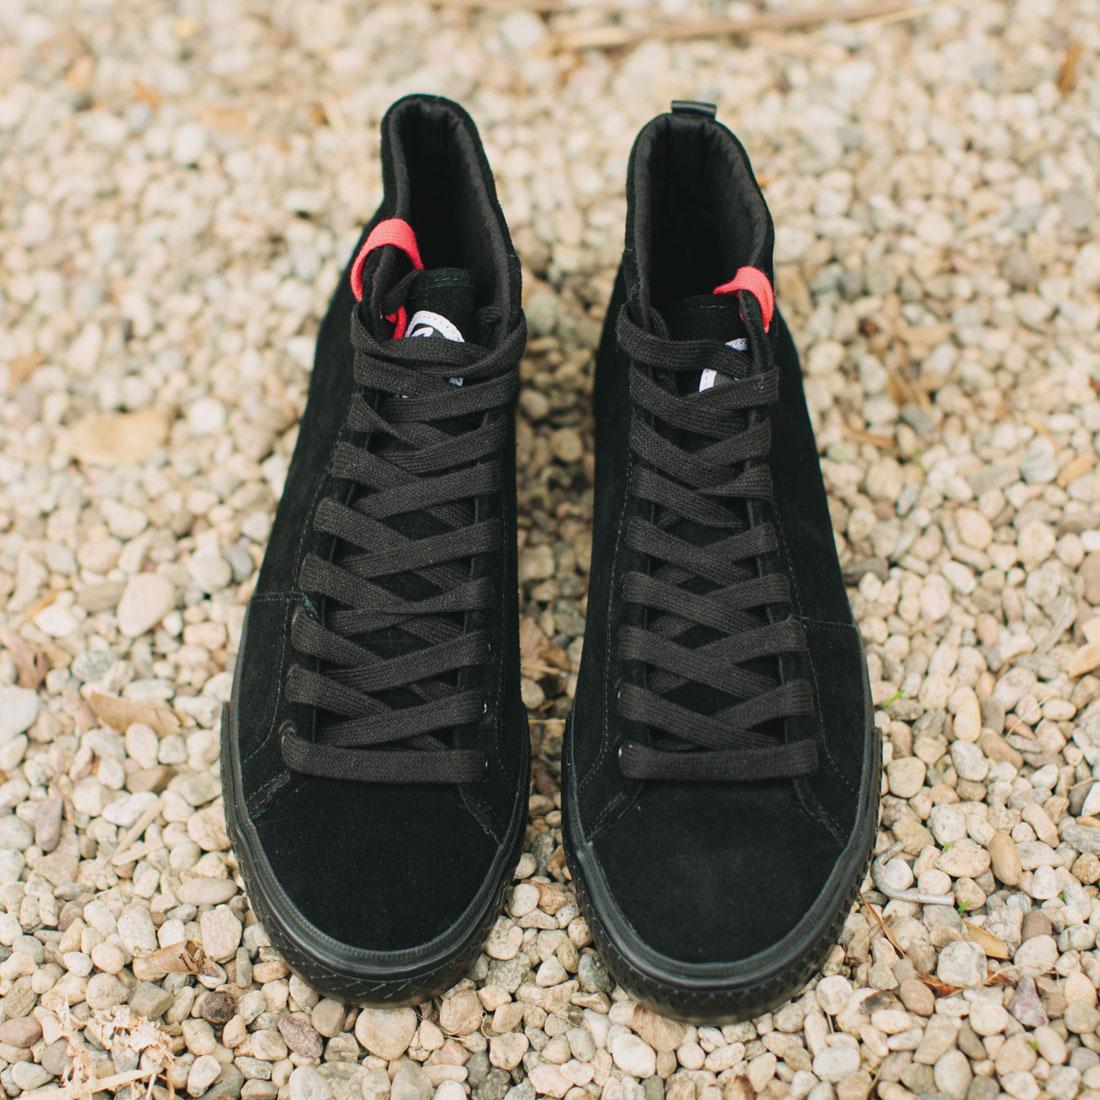 duane-peters-broadway-high-vulcanized-sneaker-black1100